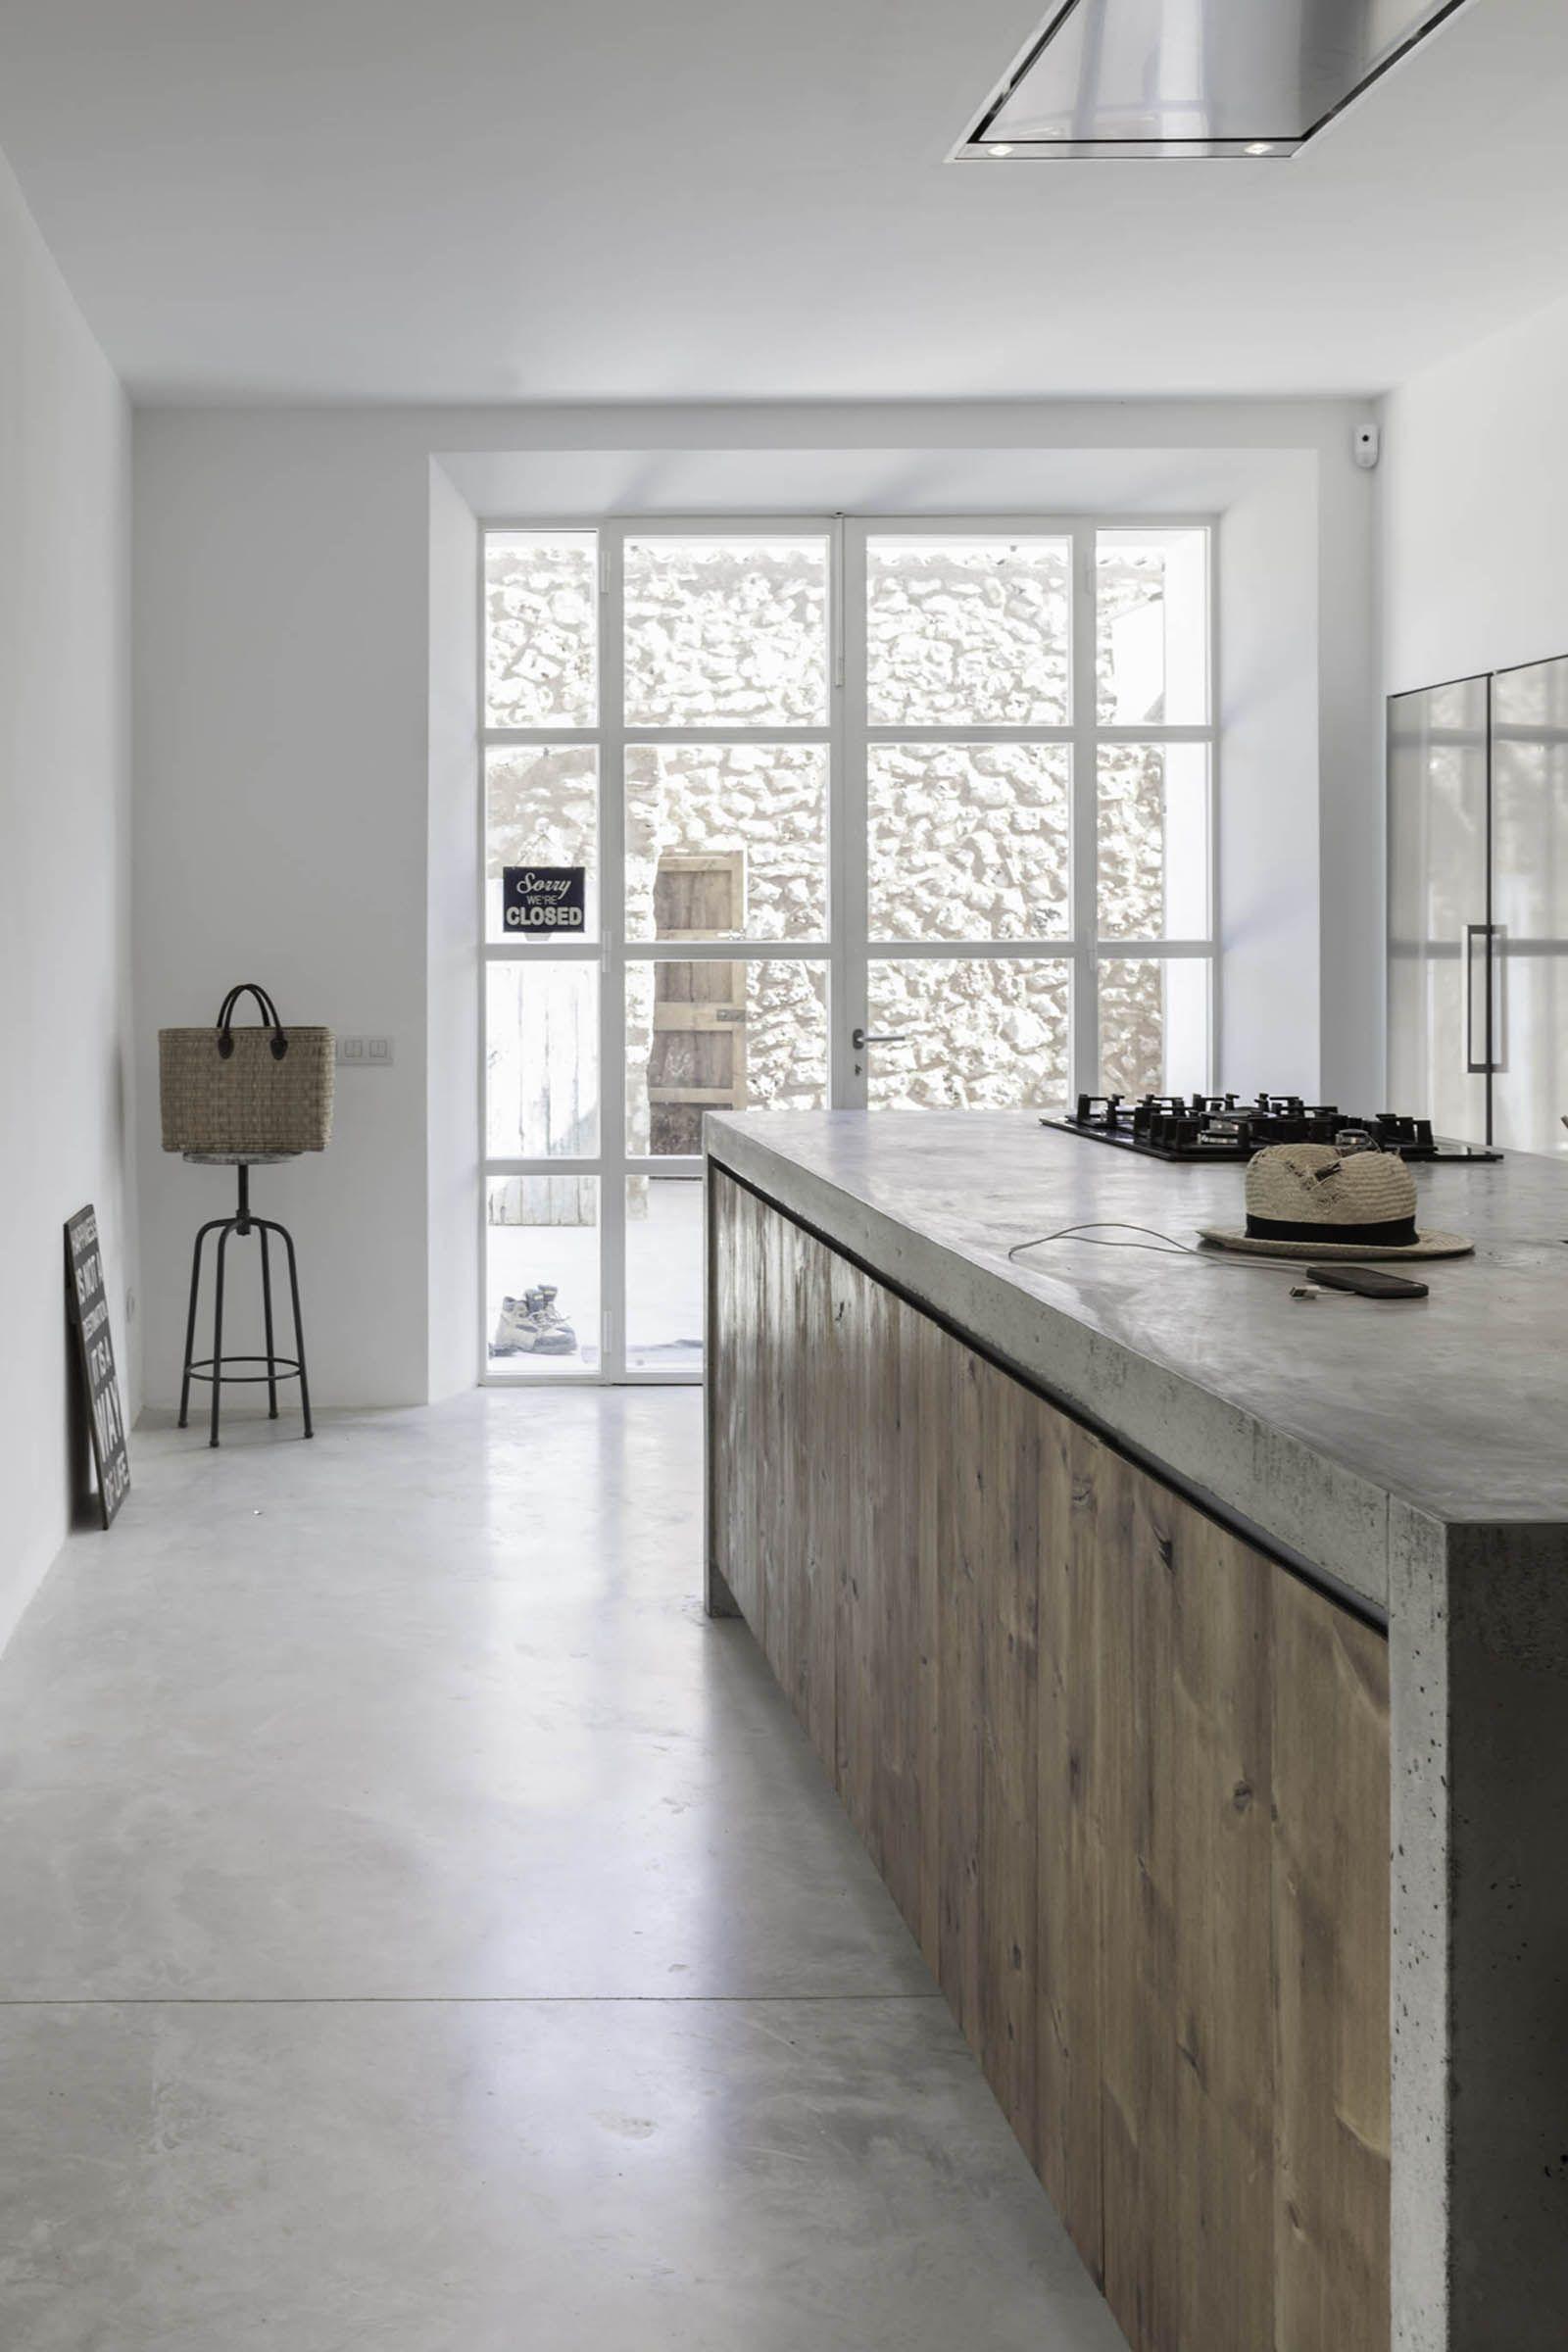 Isla Cocina alternativa fusion | cocinas | Pinterest | Cocinas ...